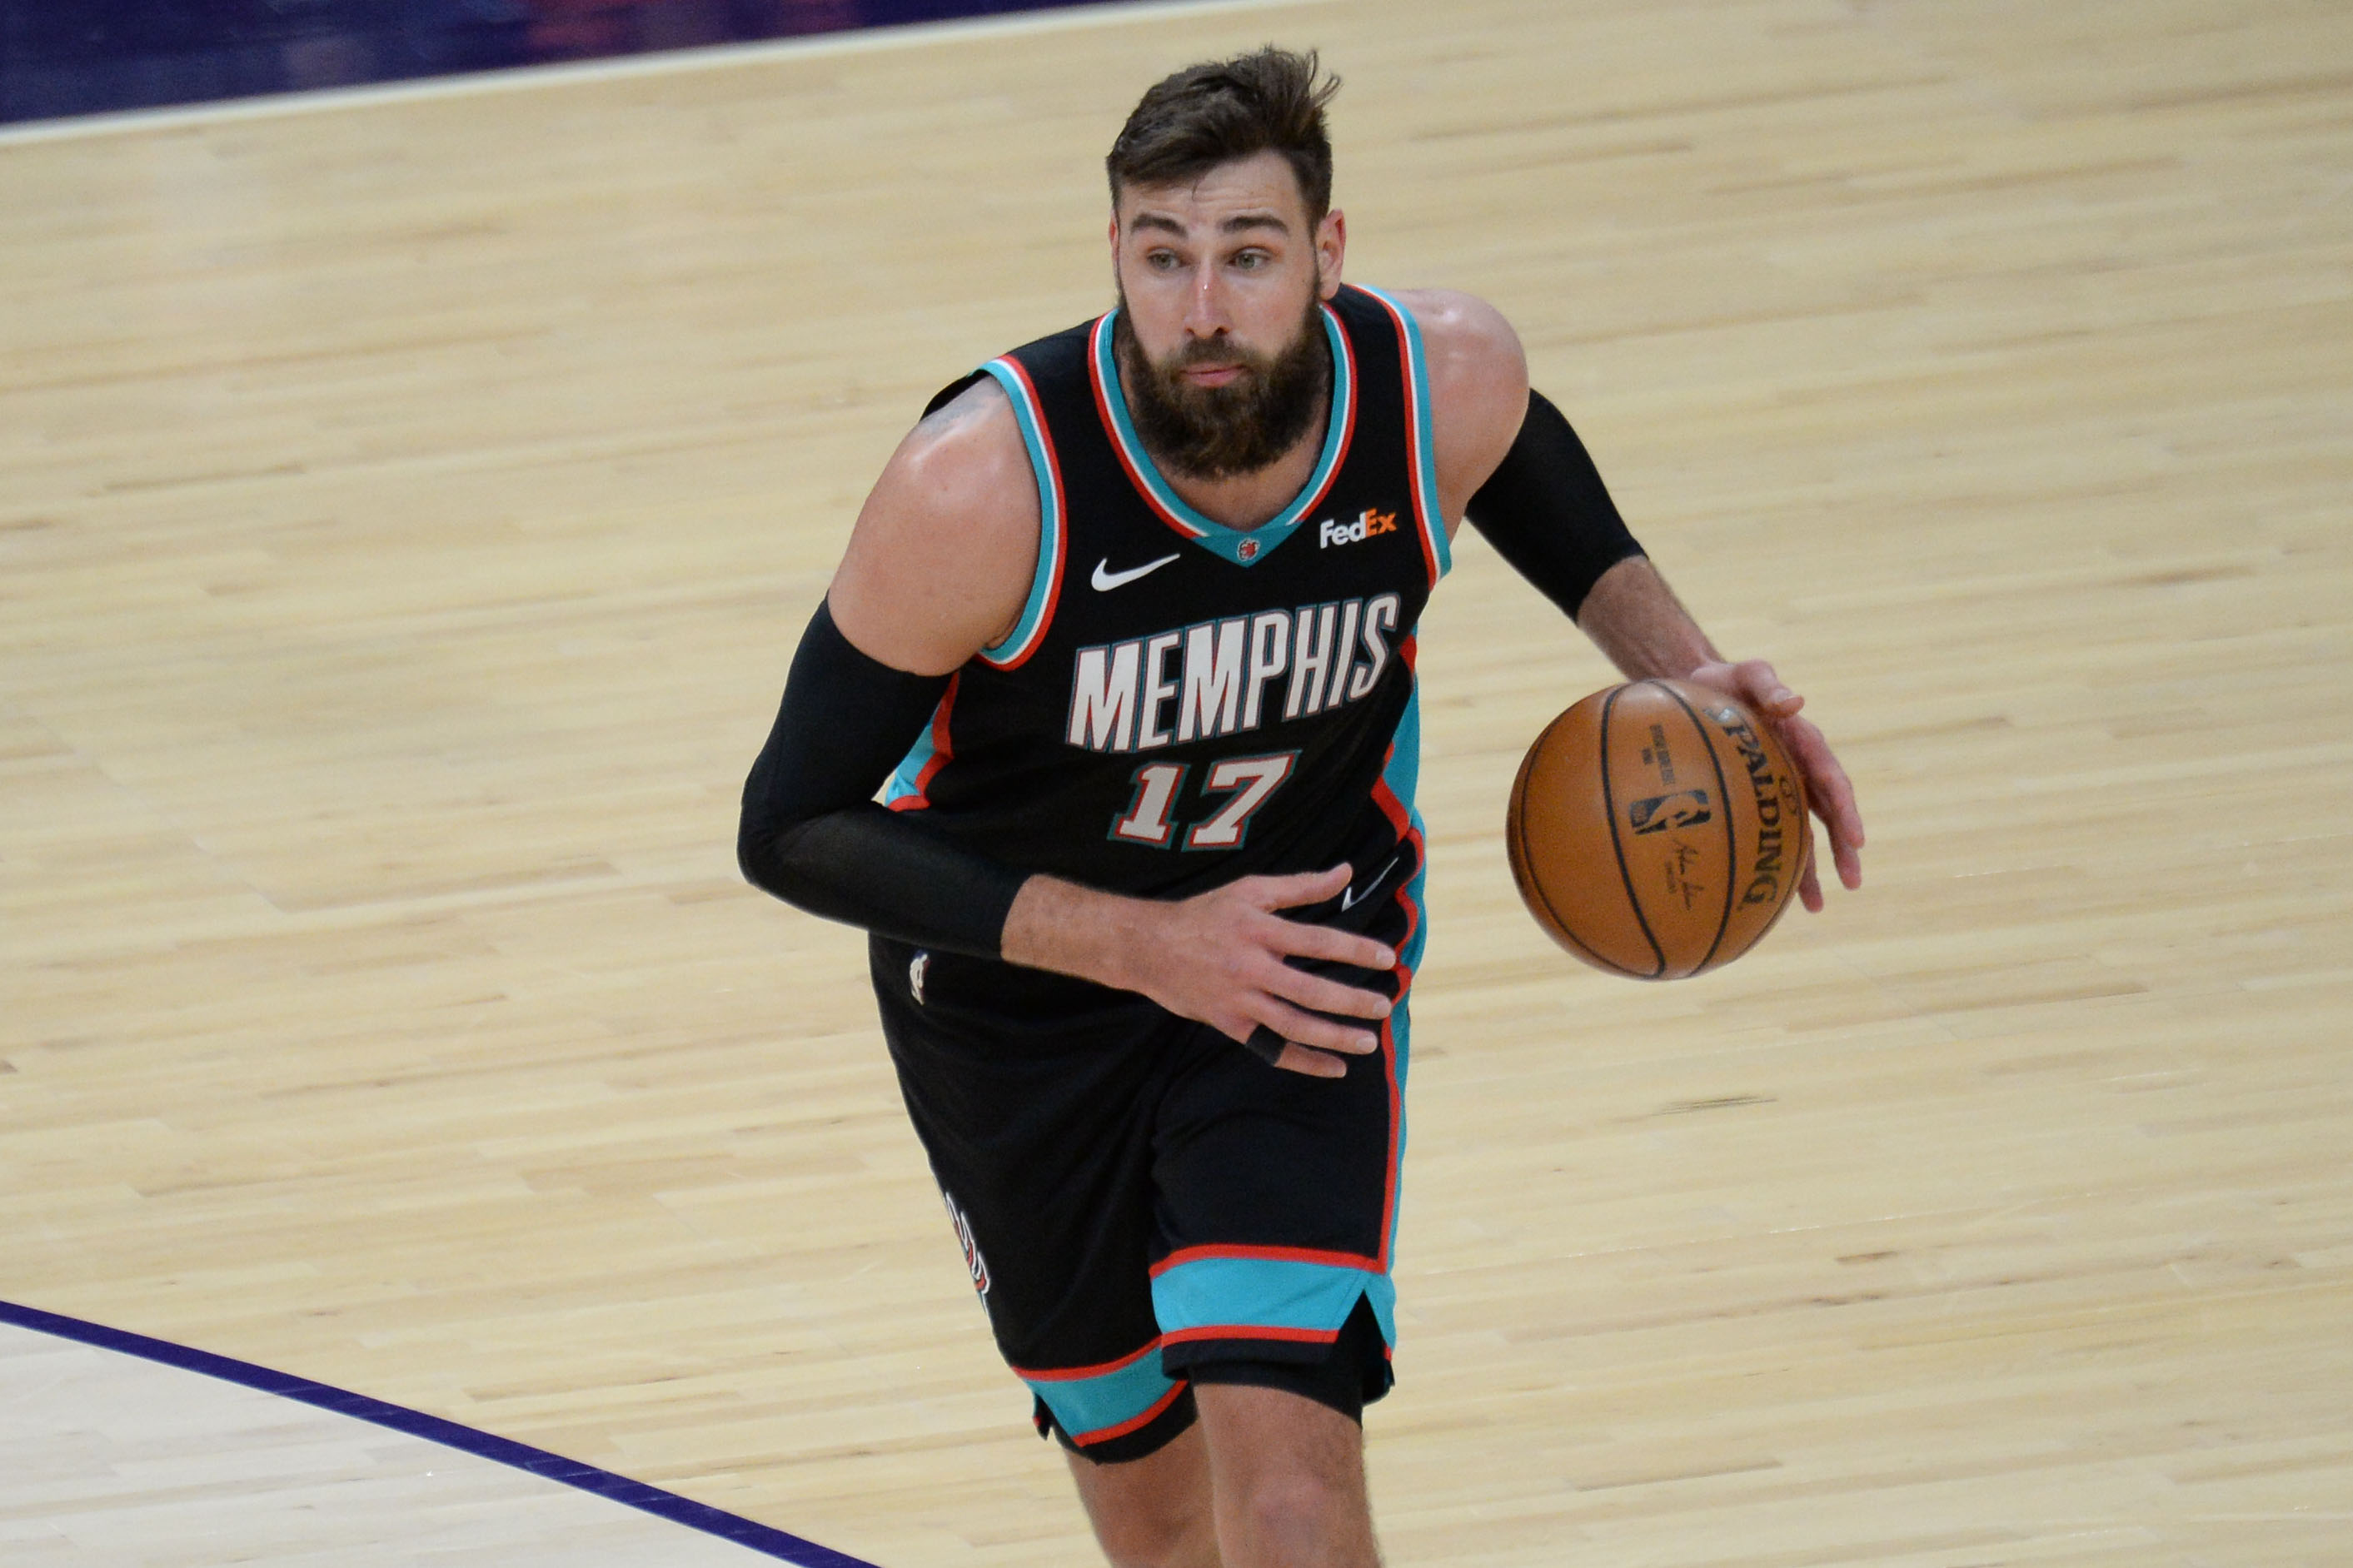 Mar 15, 2021; Phoenix, Arizona, USA; Memphis Grizzlies center Jonas Valanciunas (17) dribbles the ball against the Phoenix Suns during the second half at Phoenix Suns Arena.